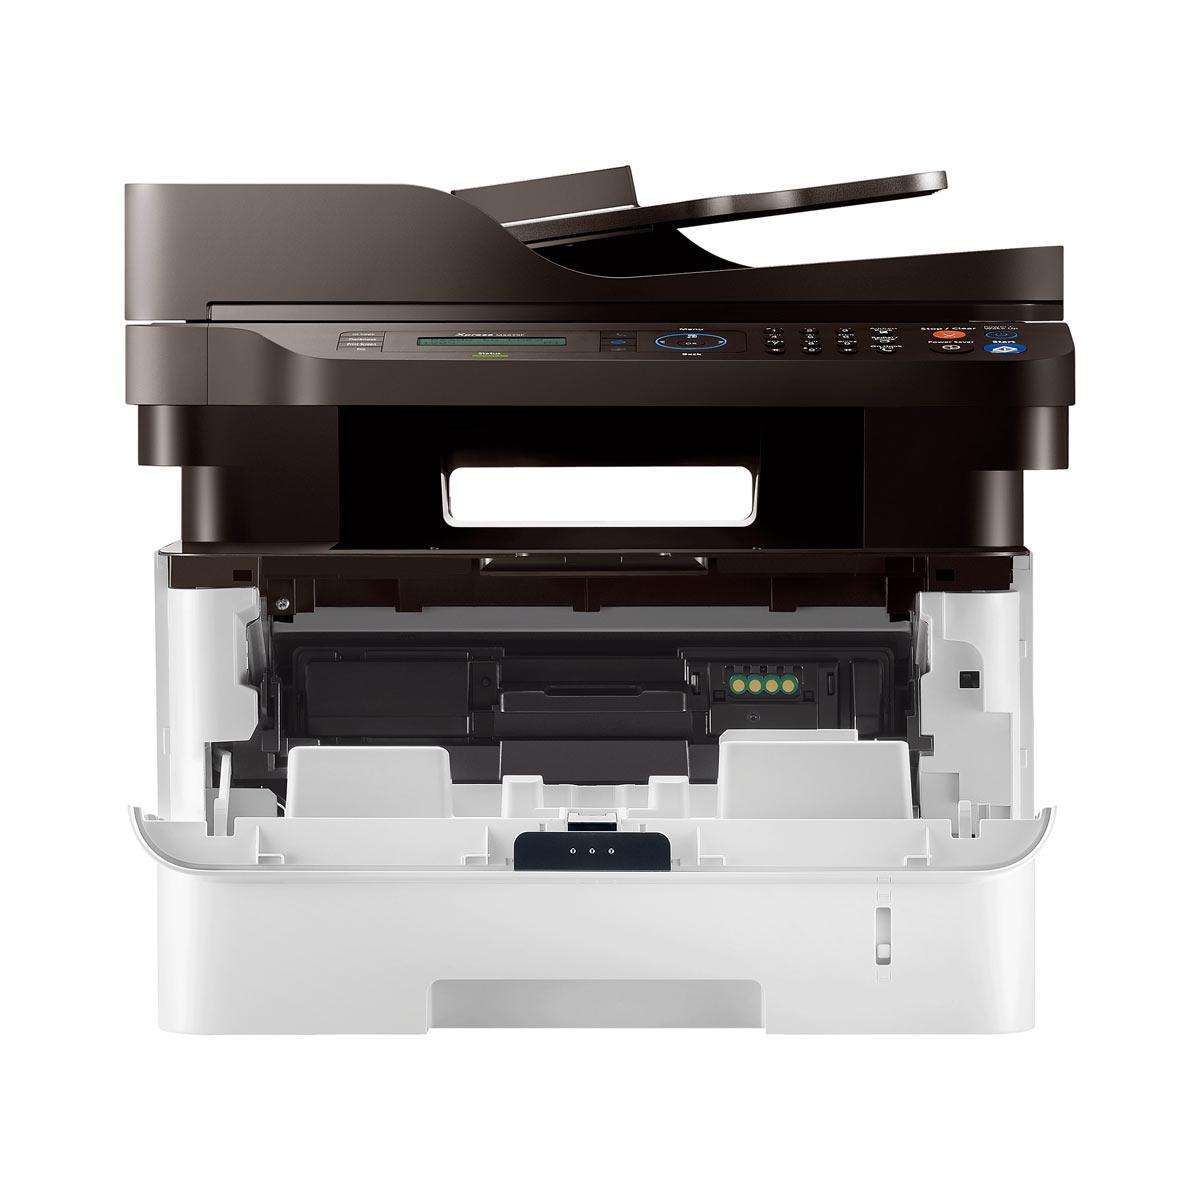 Samsung SL-M2675FN (Laser Mono./Fax/Reseau) (SL-M2675FN/SEE) - Achat / Vente Imprimante Multifonction sur Cybertek.fr - 3